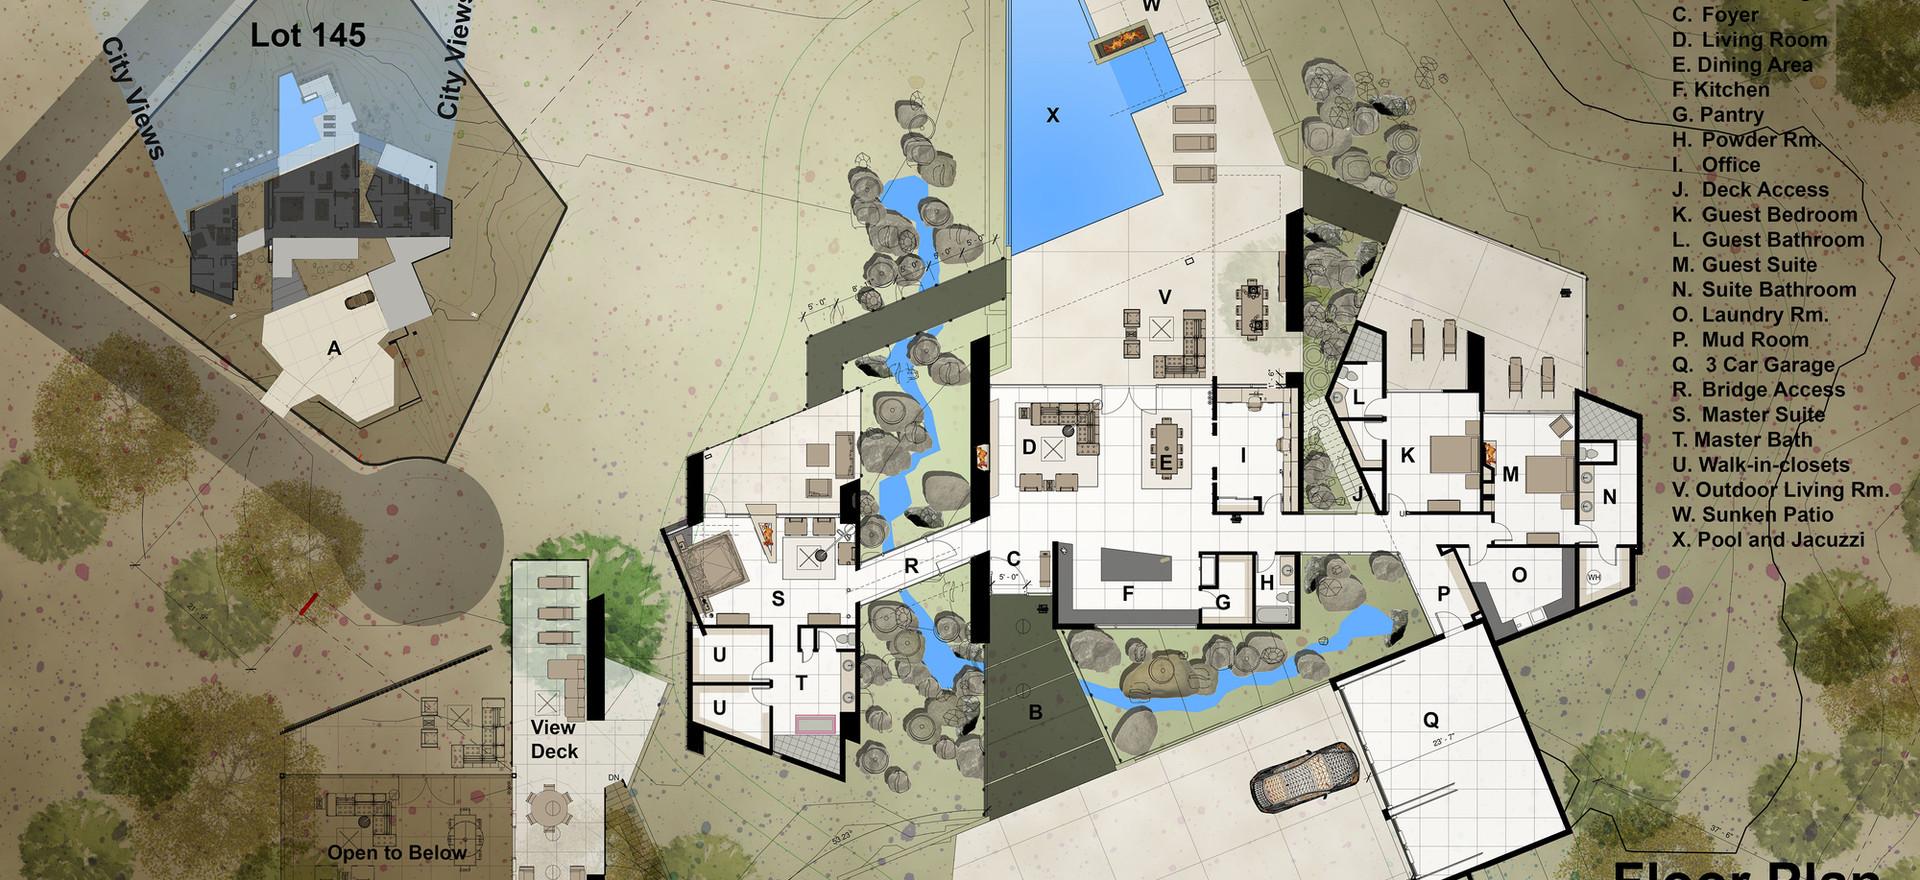 Floor-Plan-145.jpg